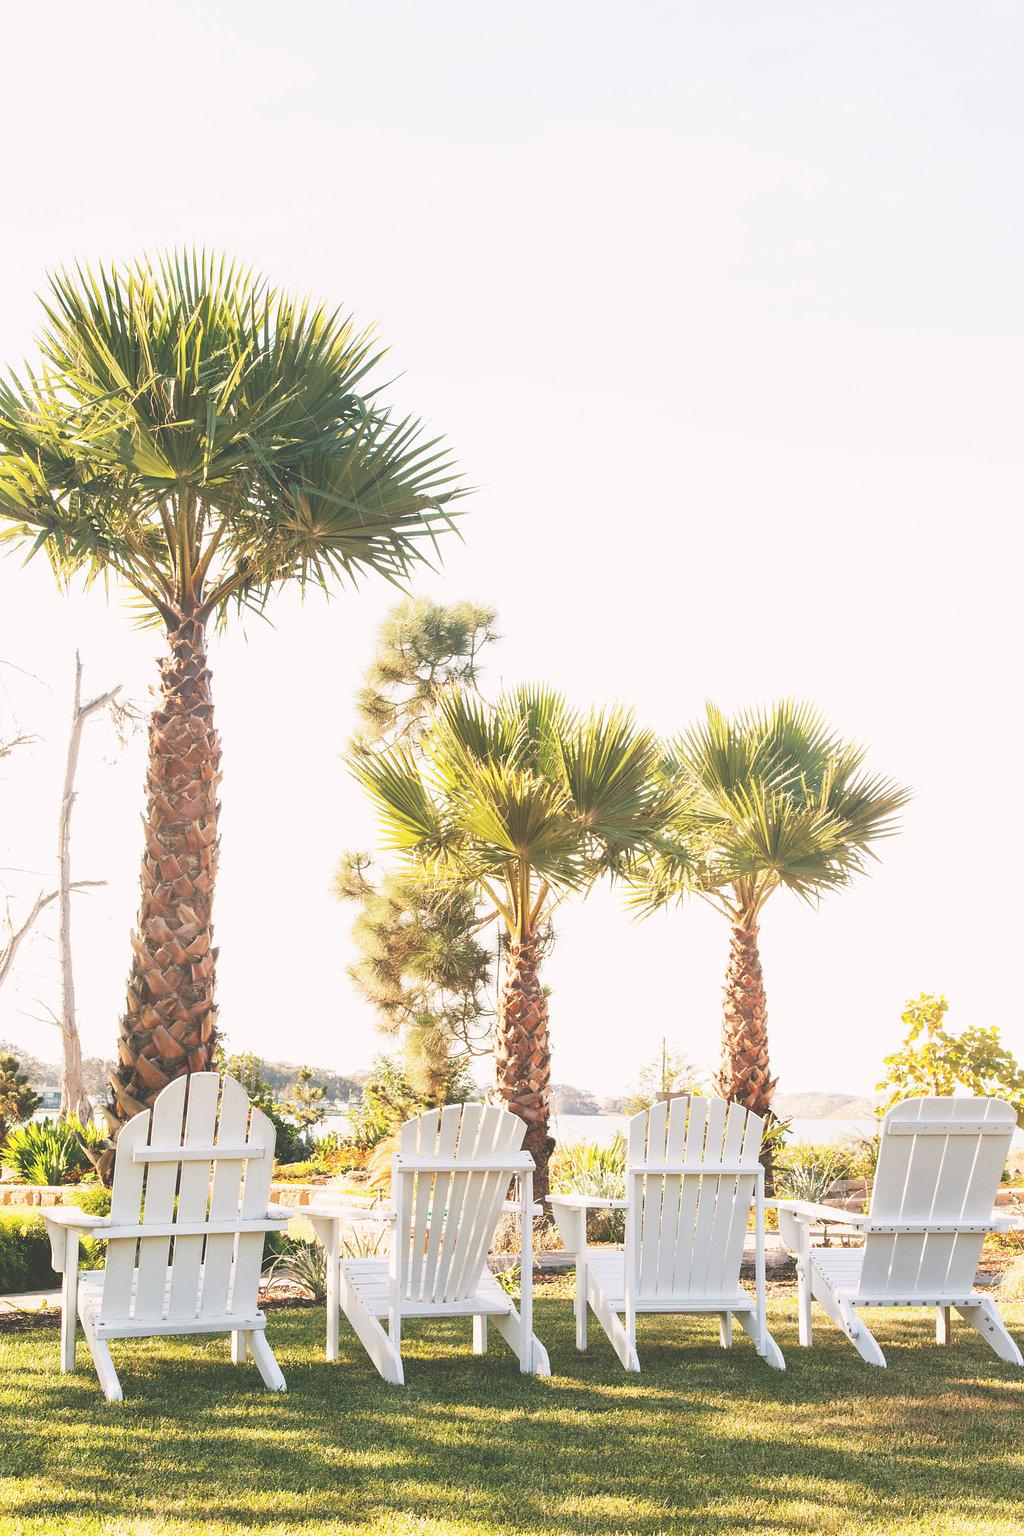 Relaxing Vacation California